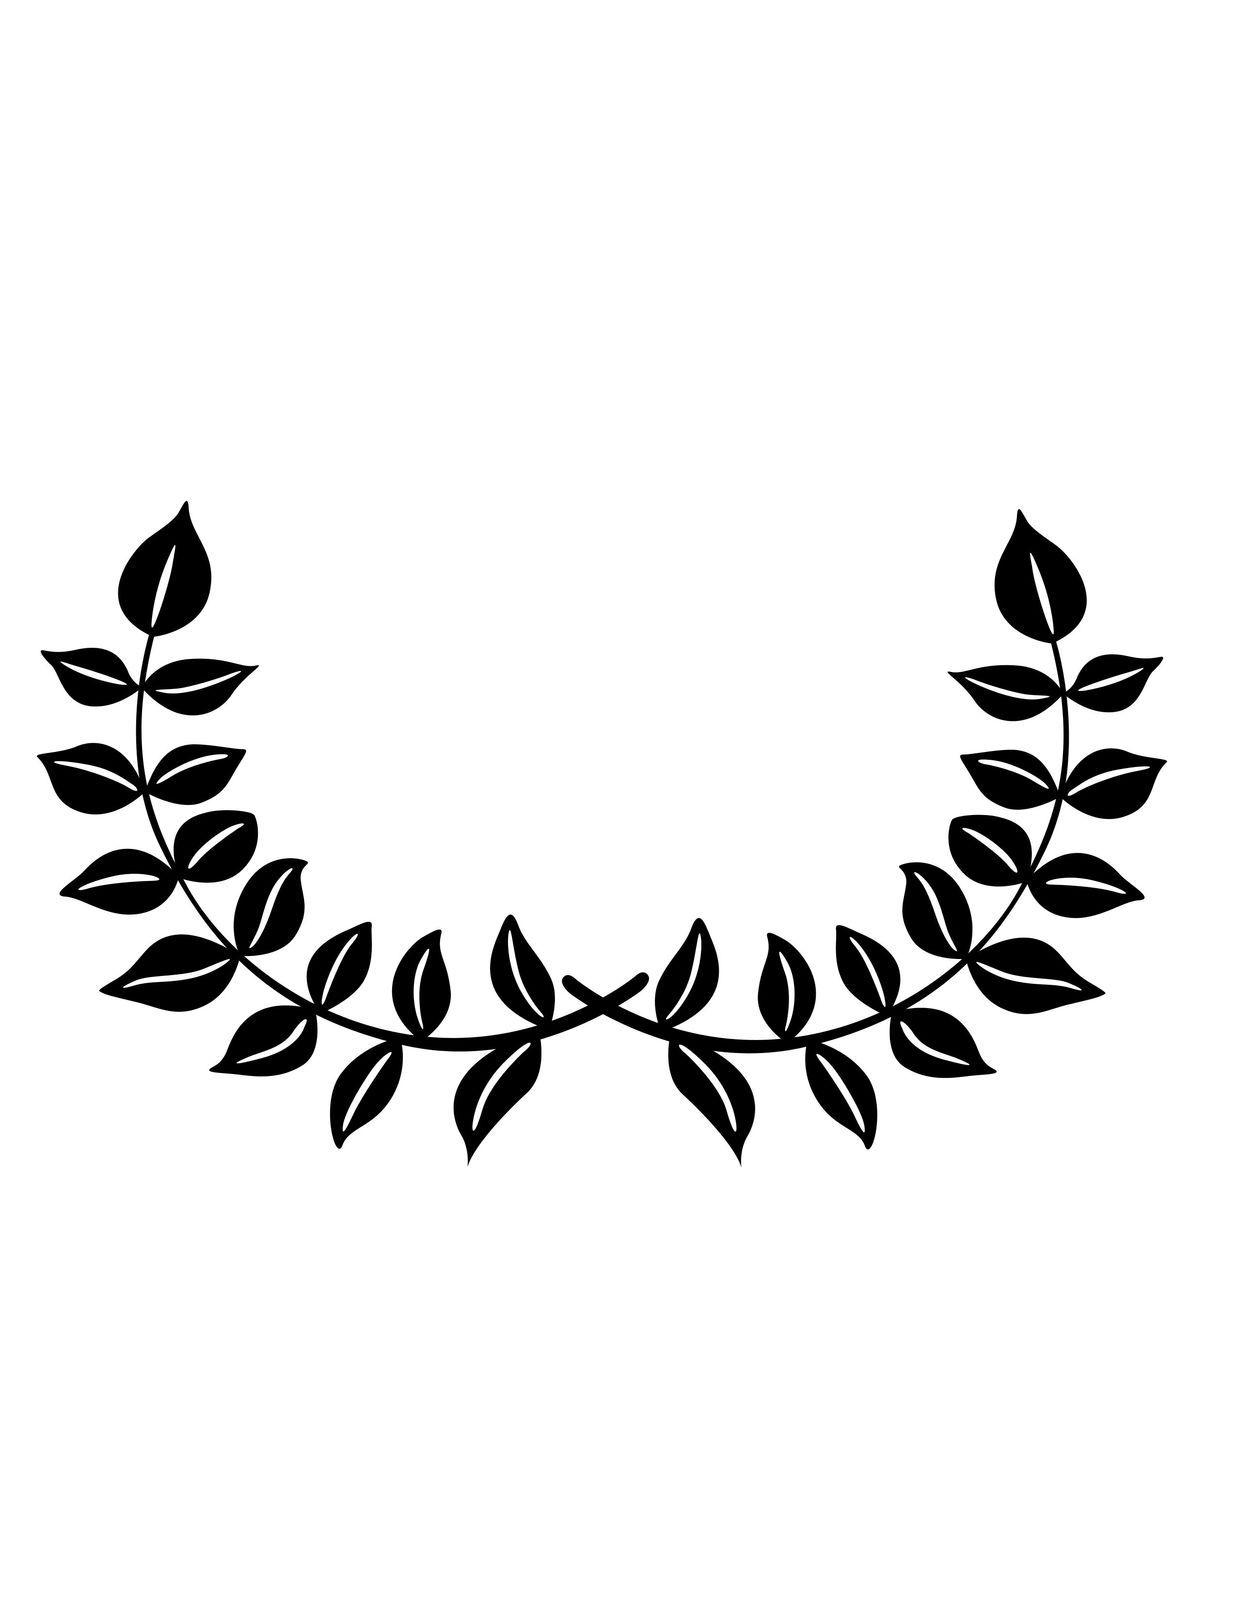 Vine Leafy Silhouette Black.